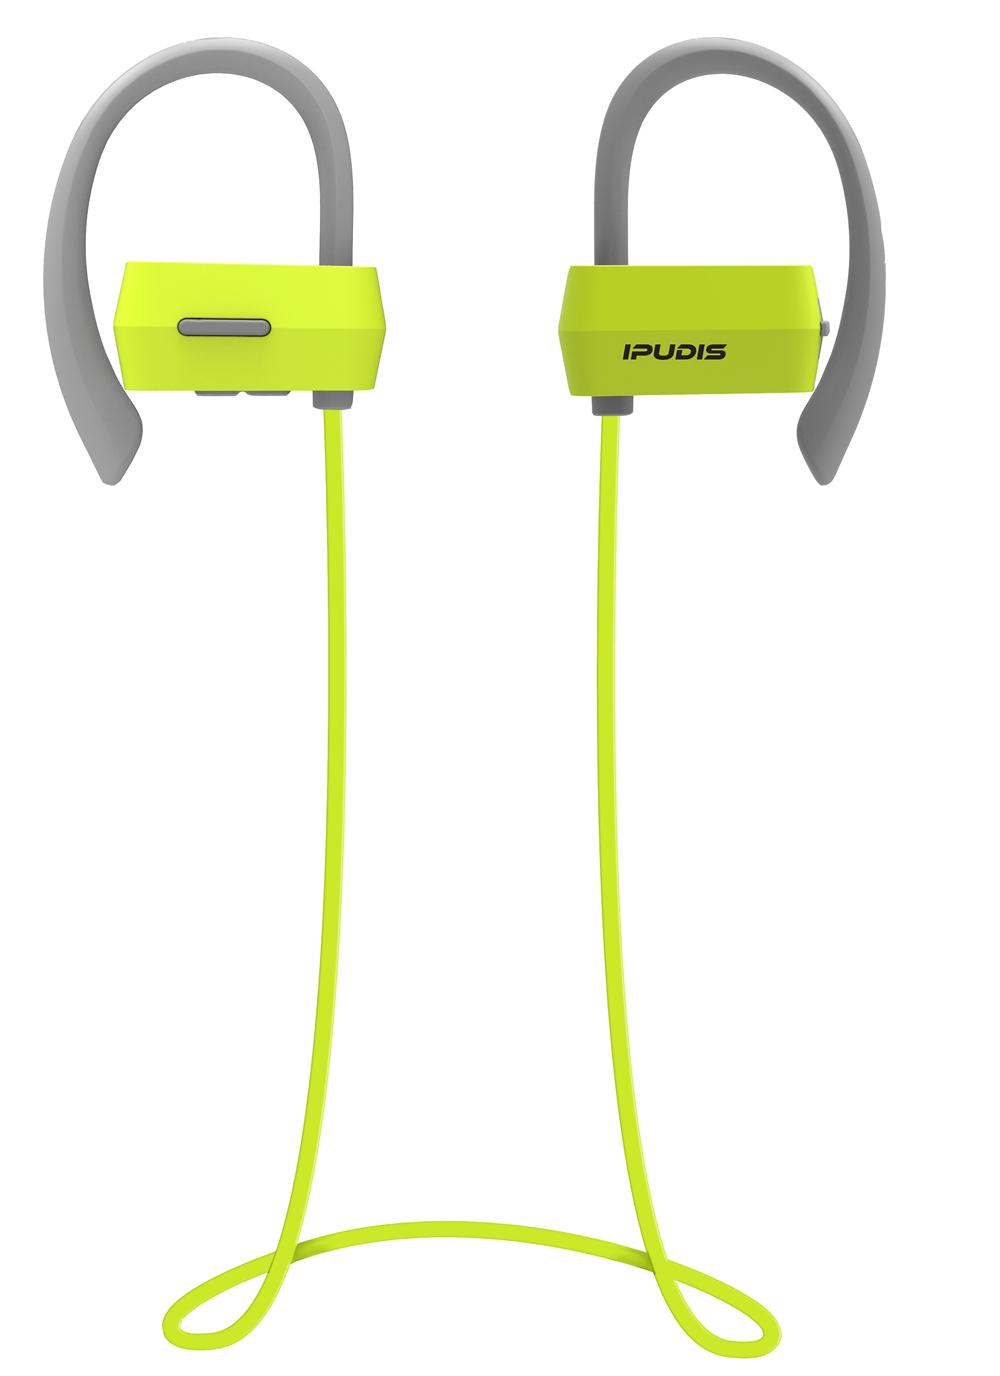 IPUDIS High-end Nano Waterproof Bluetooth earphone Earhook Wireless Headset Ear Hook Sport Headphone Clear Sound with MIC(China (Mainland))